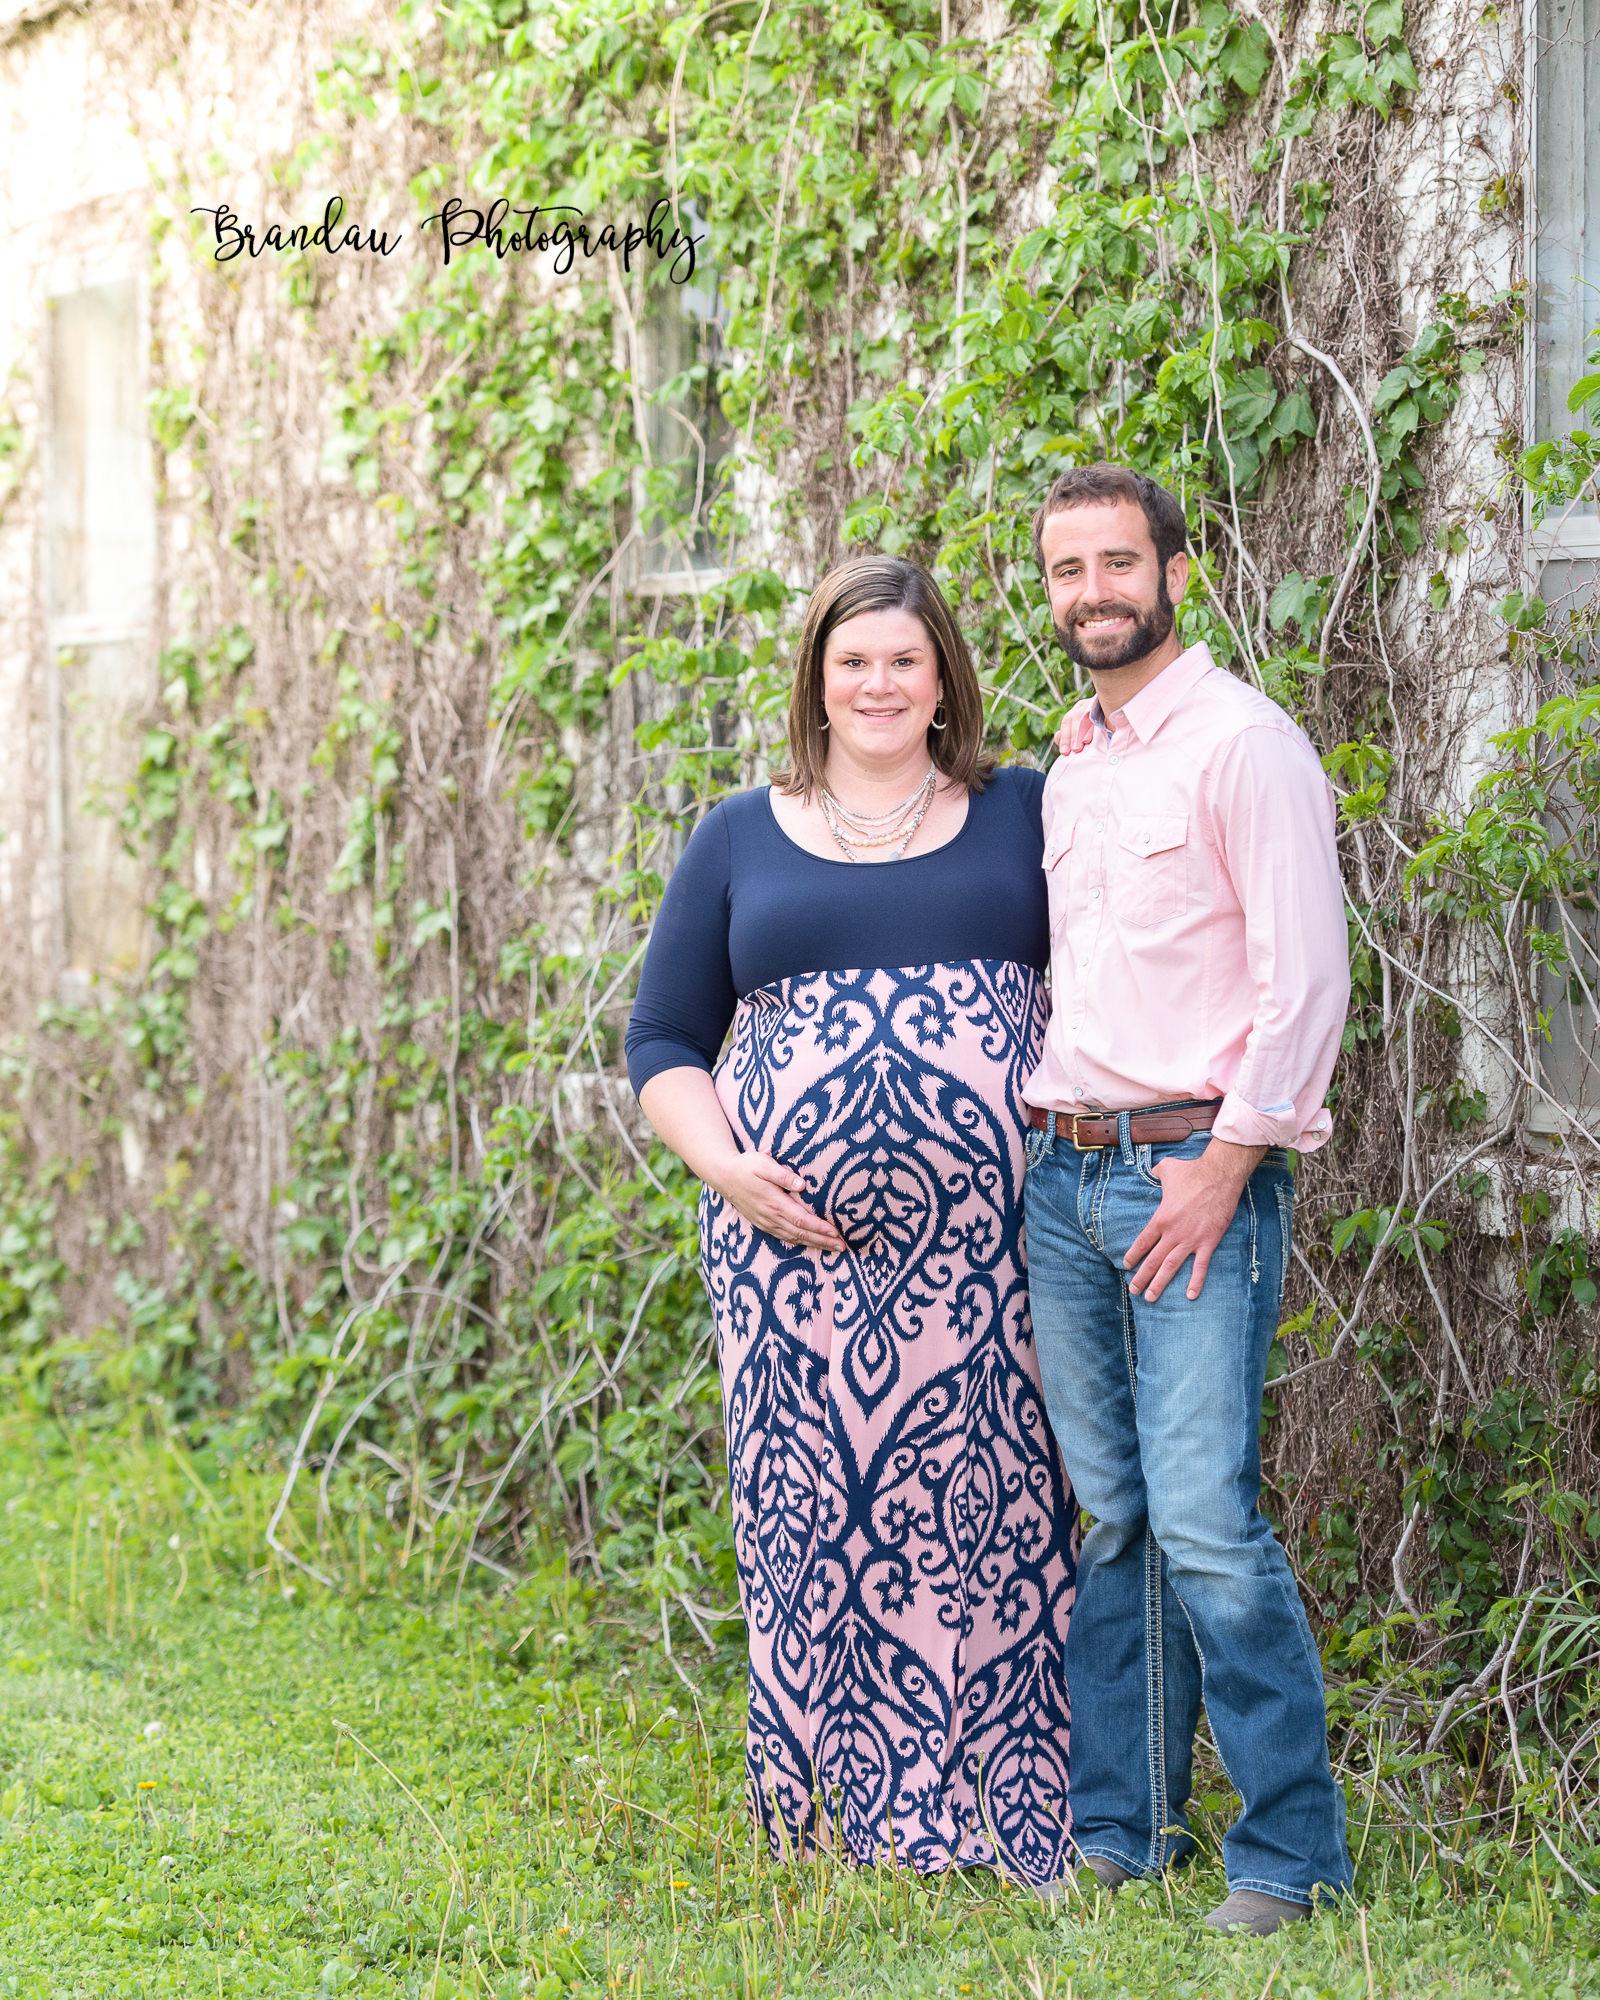 Engagement Rural Iowa_Brandau Photography-29.jpg